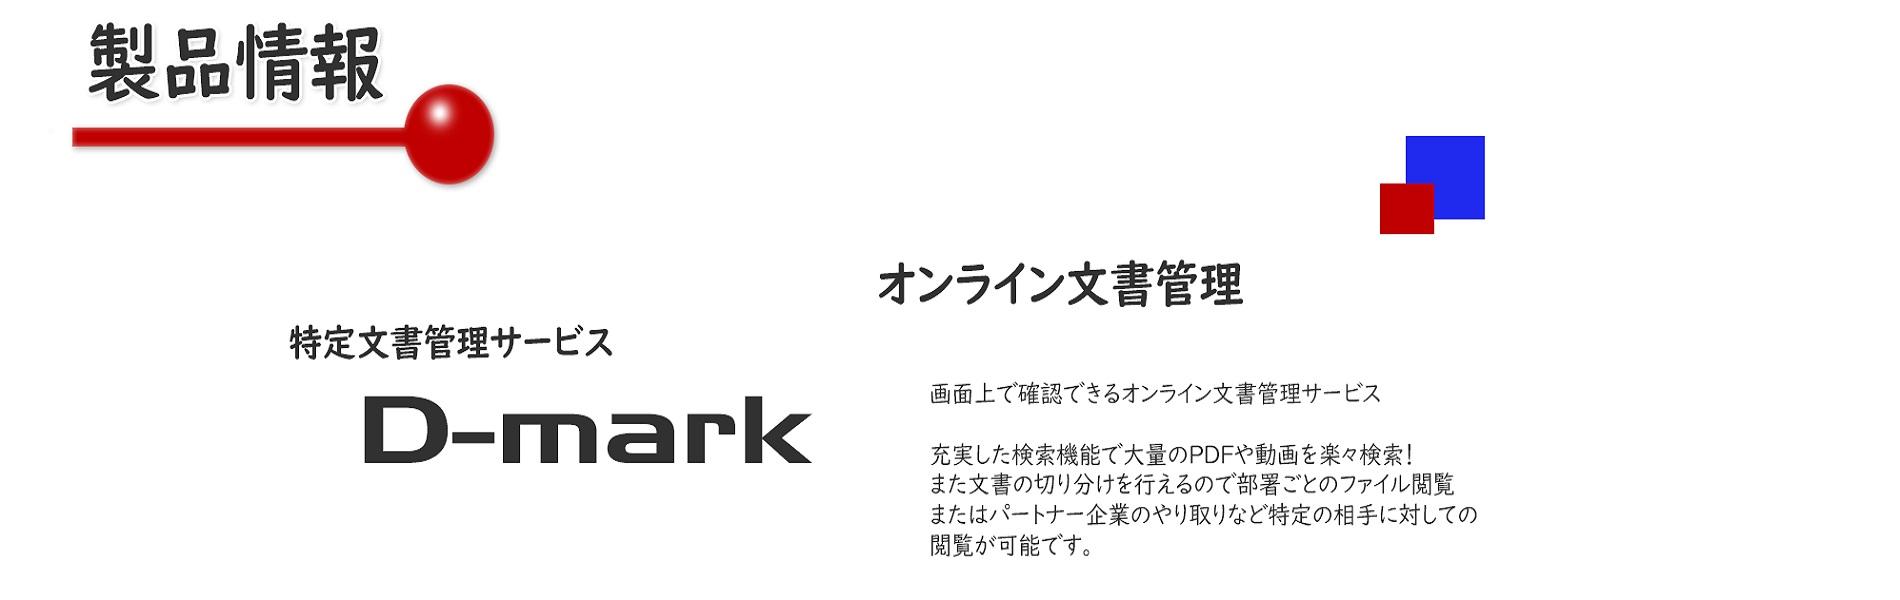 D-mark Advertising text